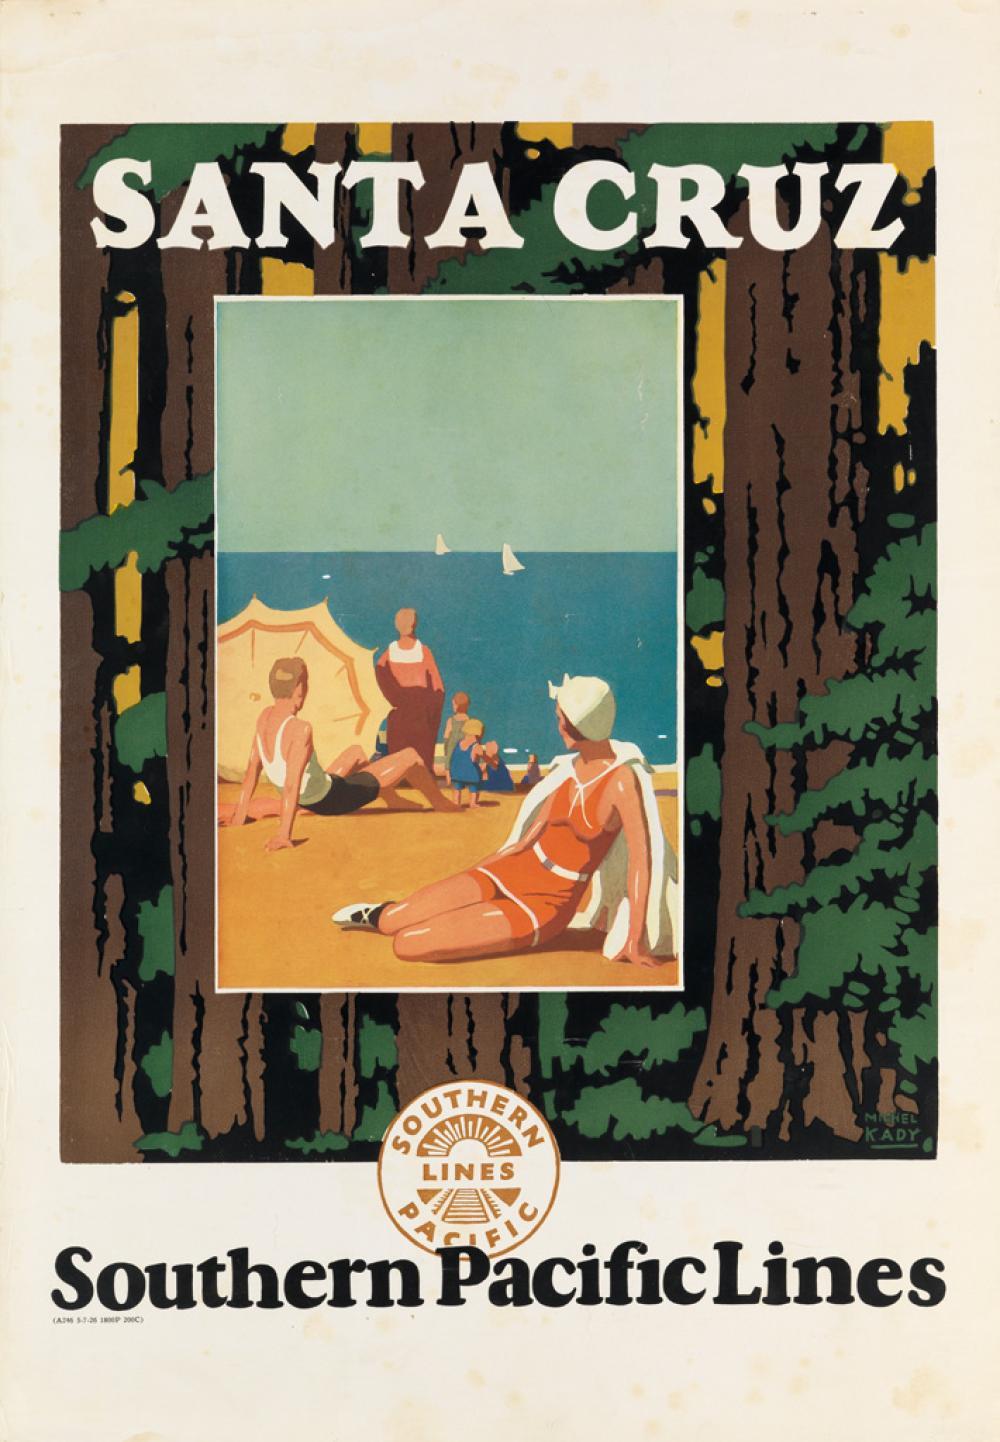 MICHEL KADY (1901-1977). SANTA CRUZ / SOUTHEN PACIFIC LINES. 1926. 23x16 inches, 58x40 cm.